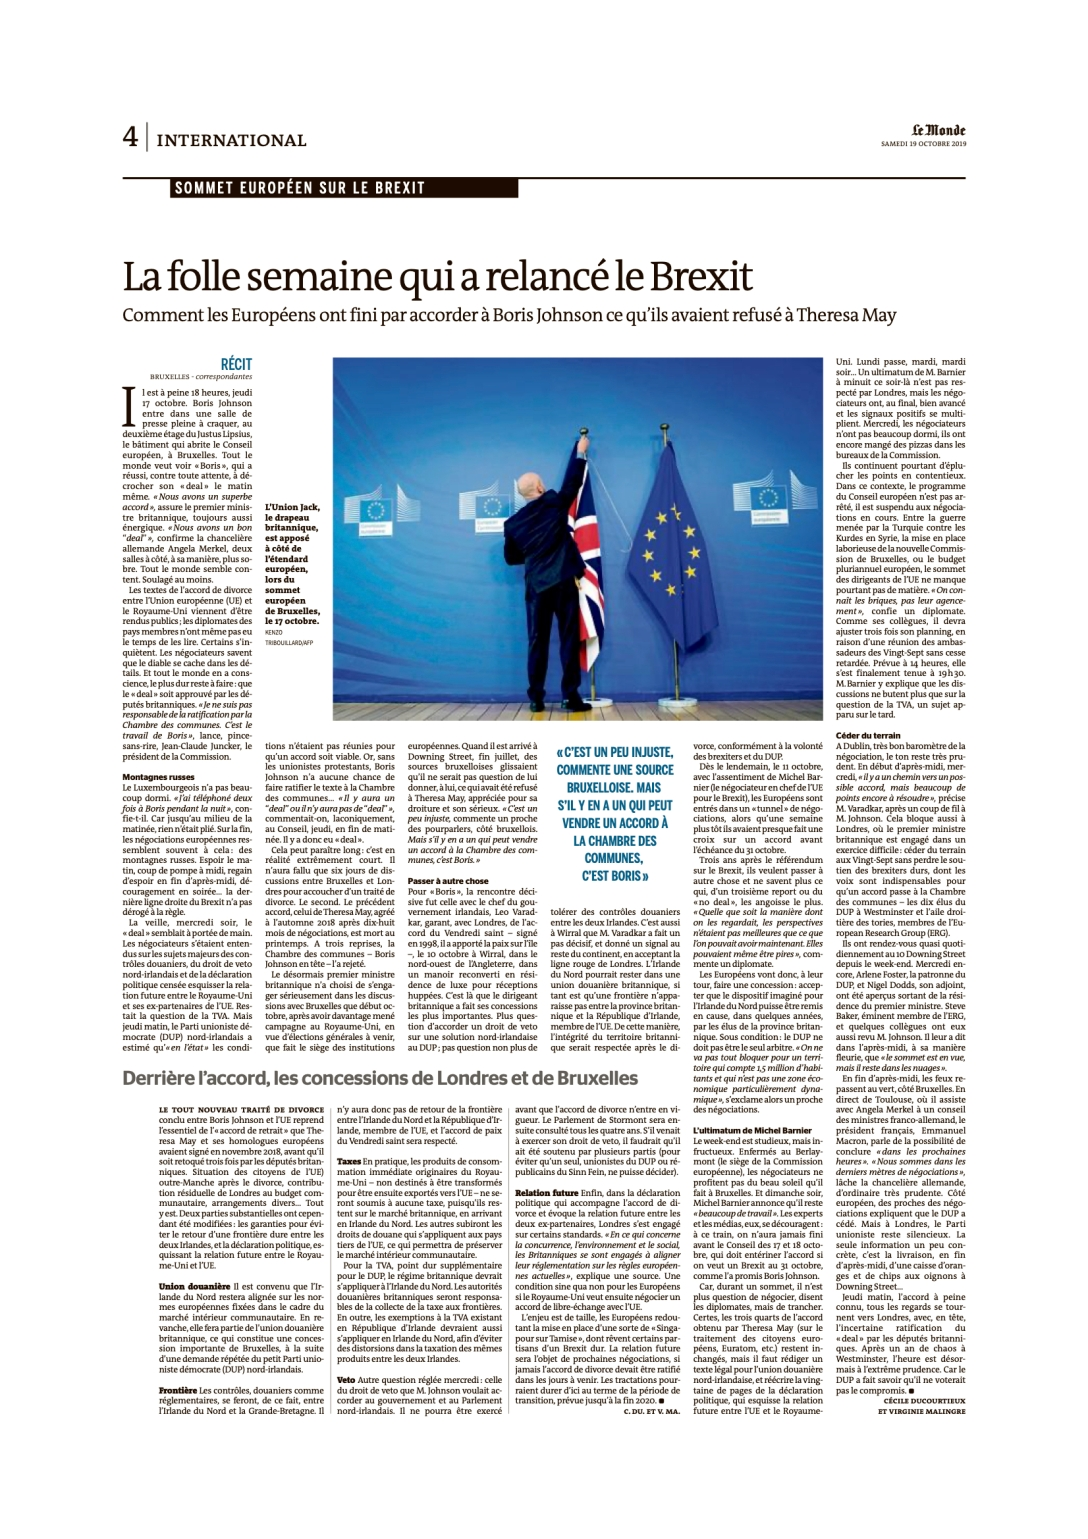 Acuerdo UE UK valoracion.jpg